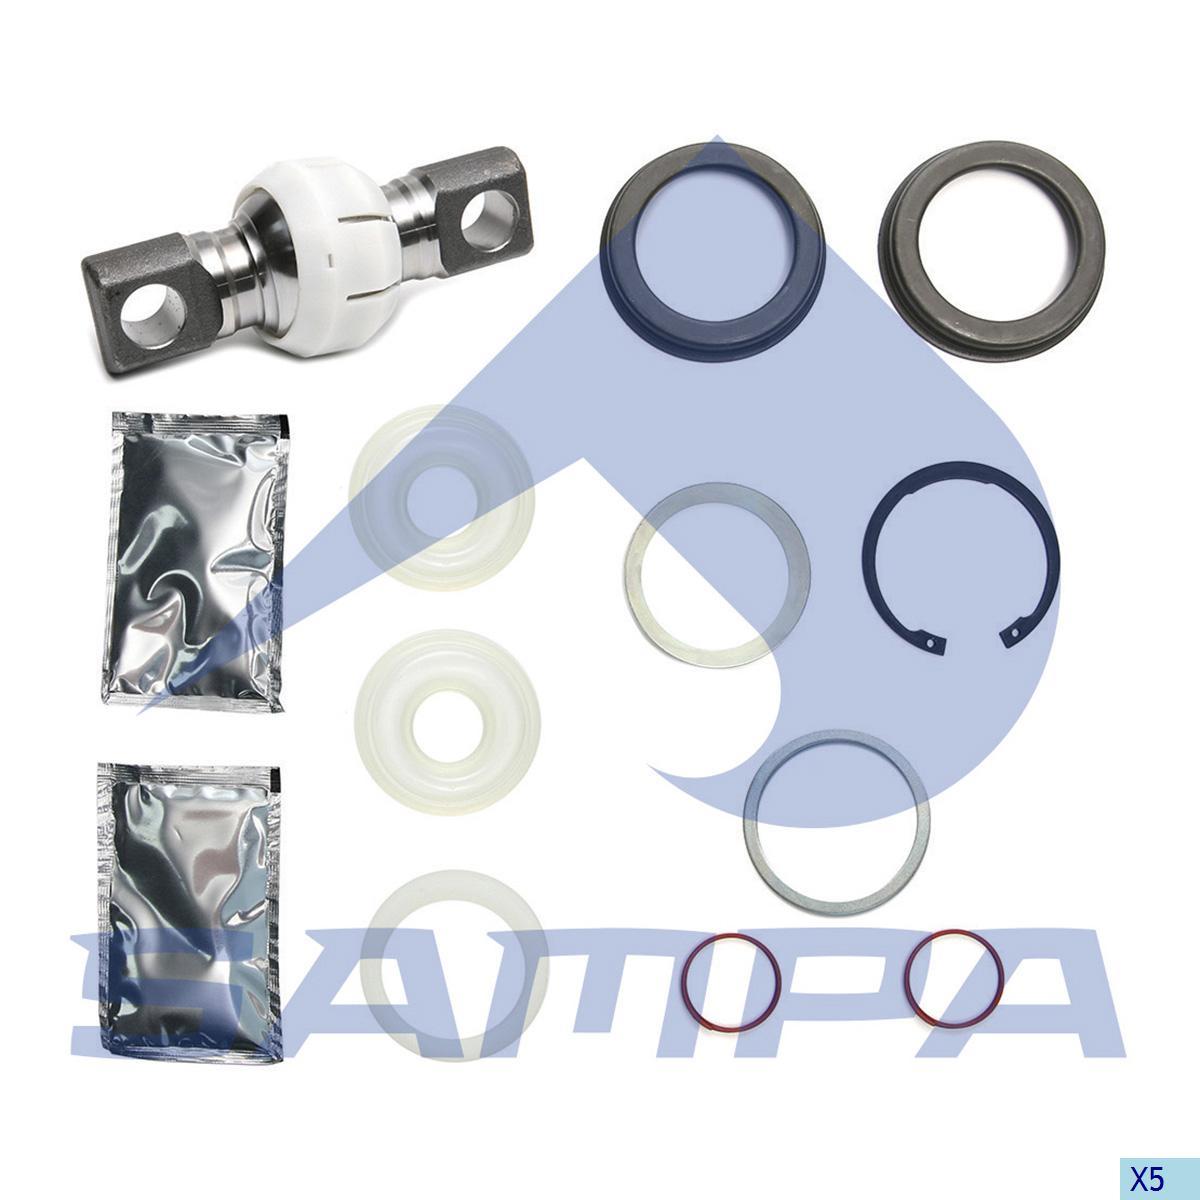 Repair Kit, Axle Rod, Man, Suspension